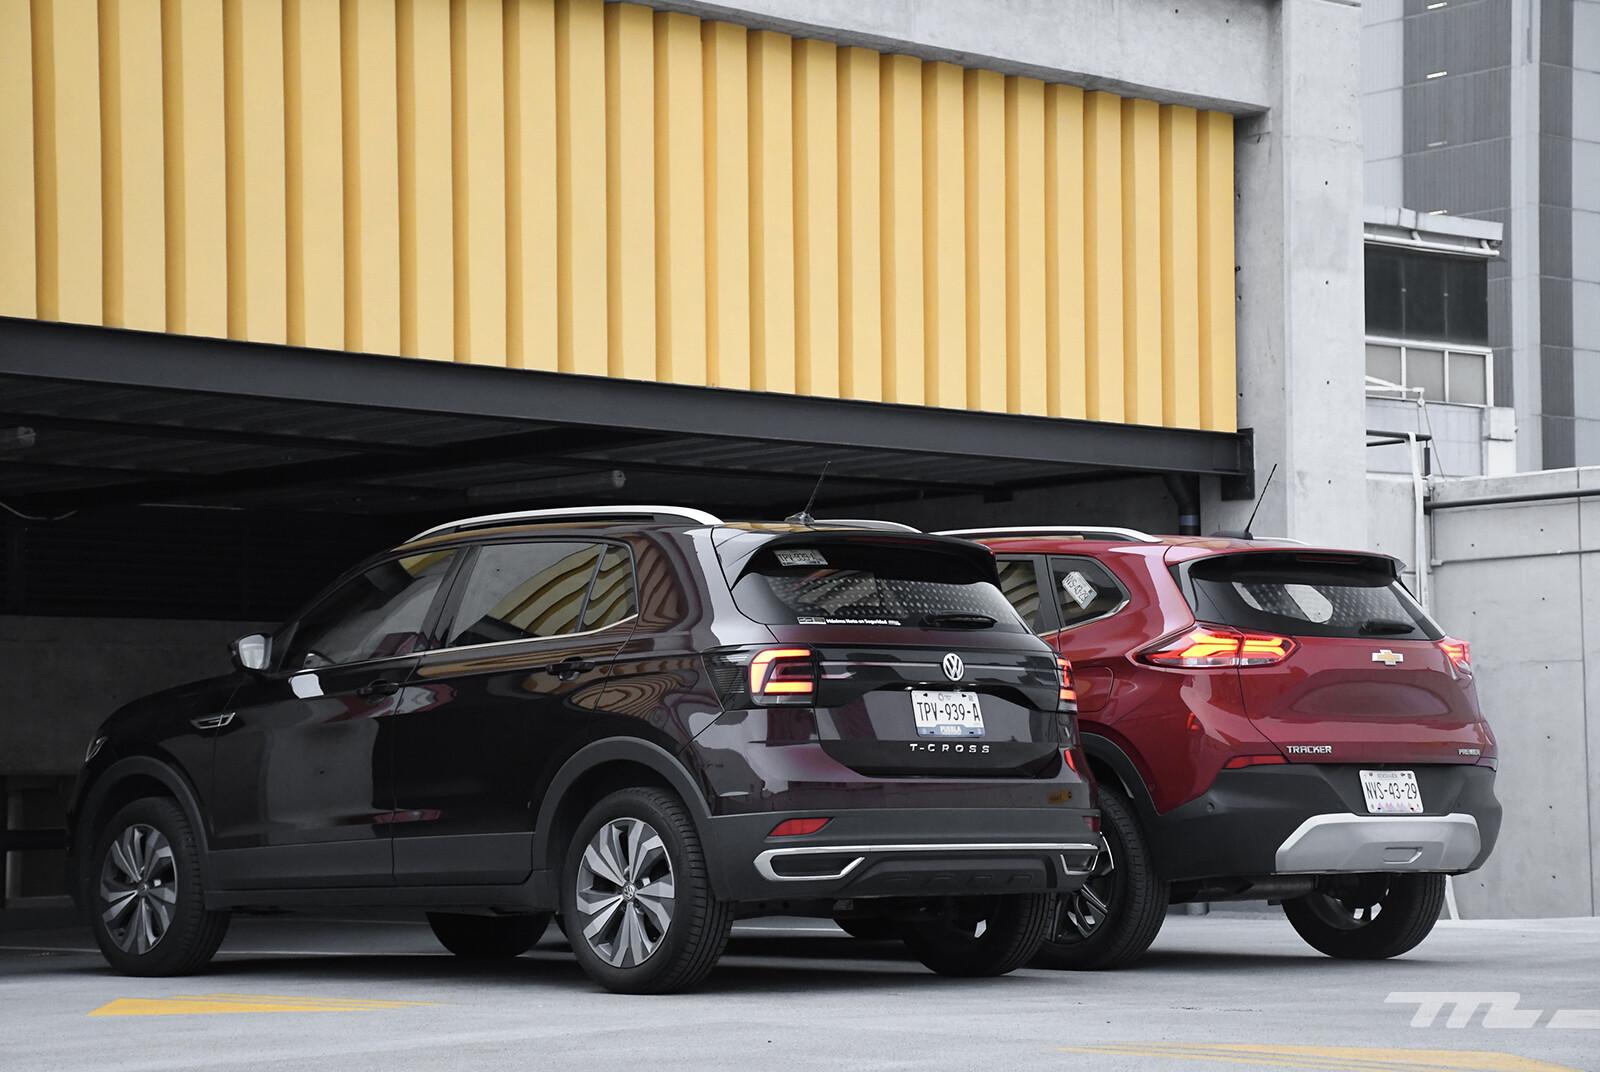 Foto de Chevrolet Tracker vs. Volkswagen T-Cross (comparativa) (6/29)